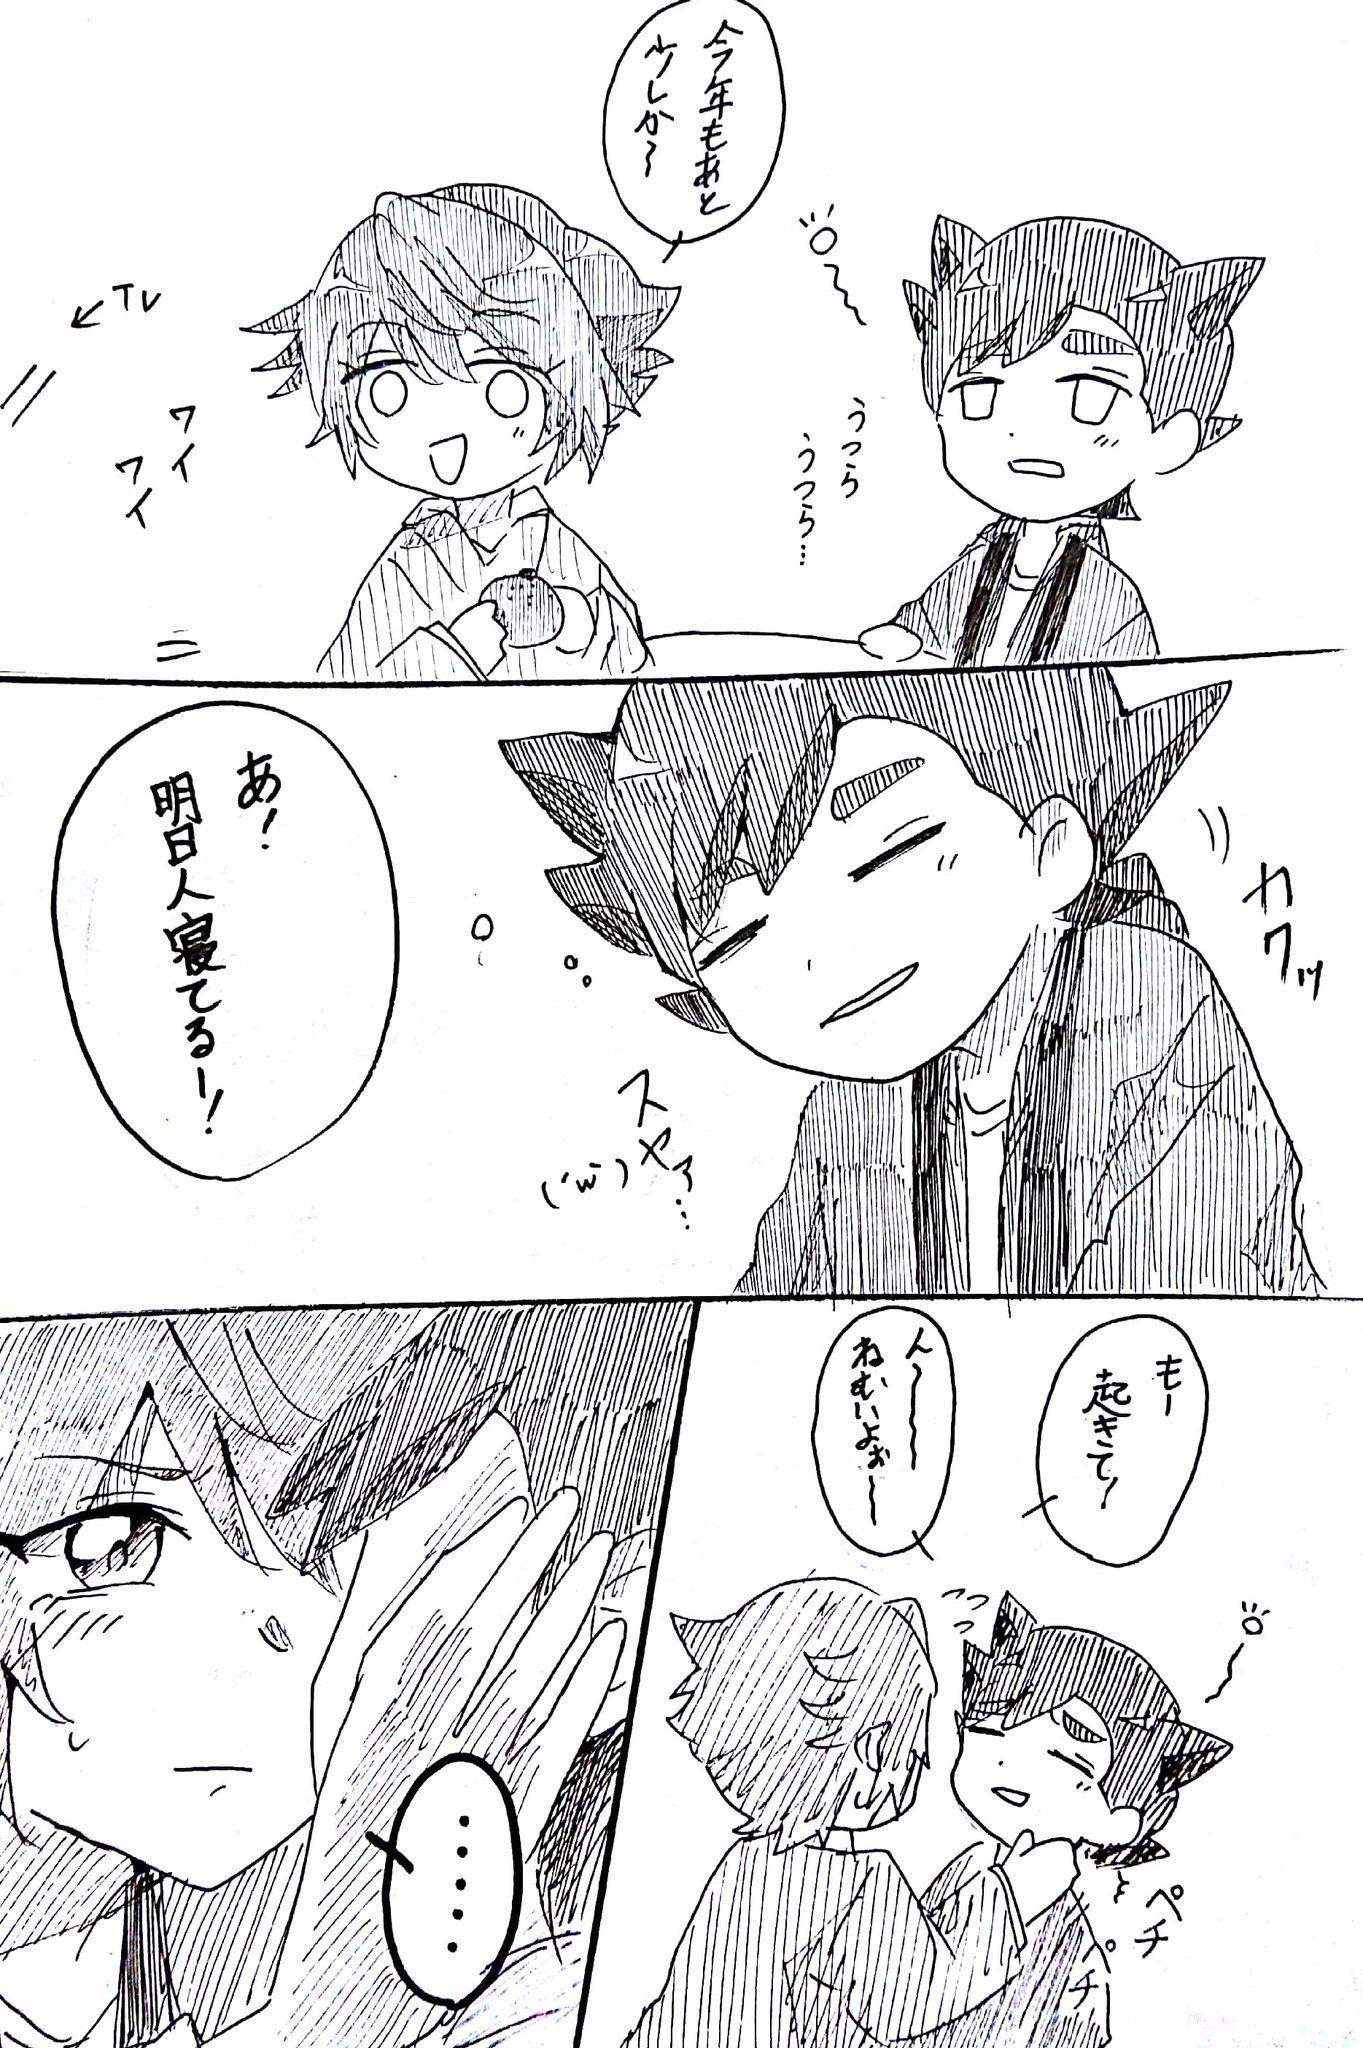 Pin By Yaya Sham On Inazuma Eleven Eleventh Anime Orion